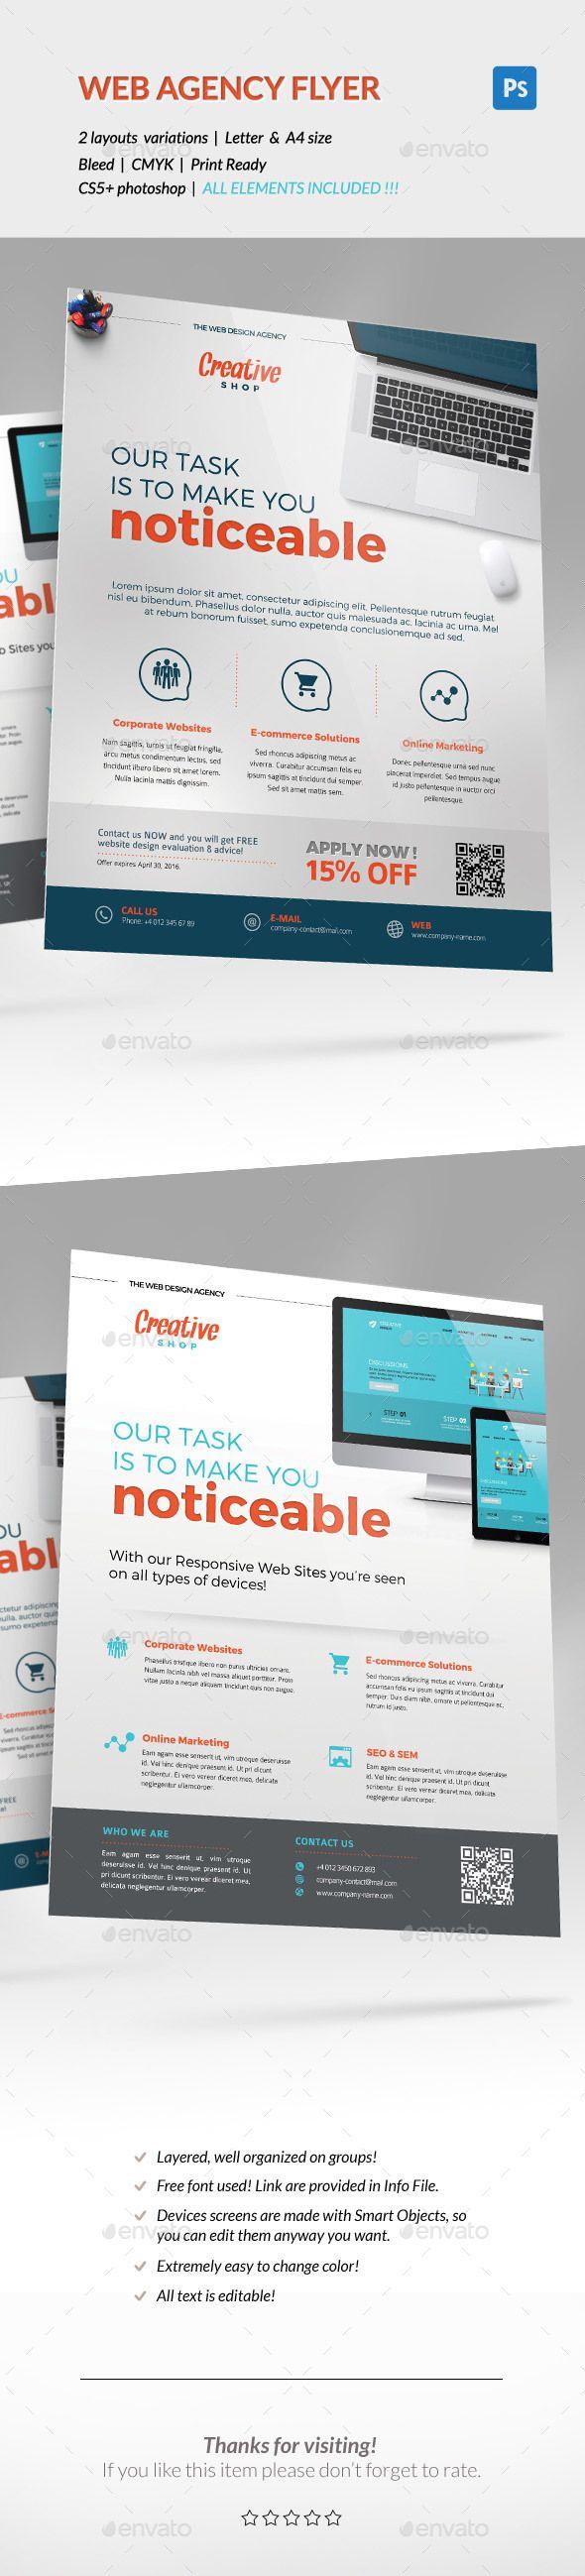 Web Design Agency Corporate Flyer Template PSD #design Download: http://graphicriver.net/item/corporate-flyer-web-design-agency-/14145902?ref=ksioks